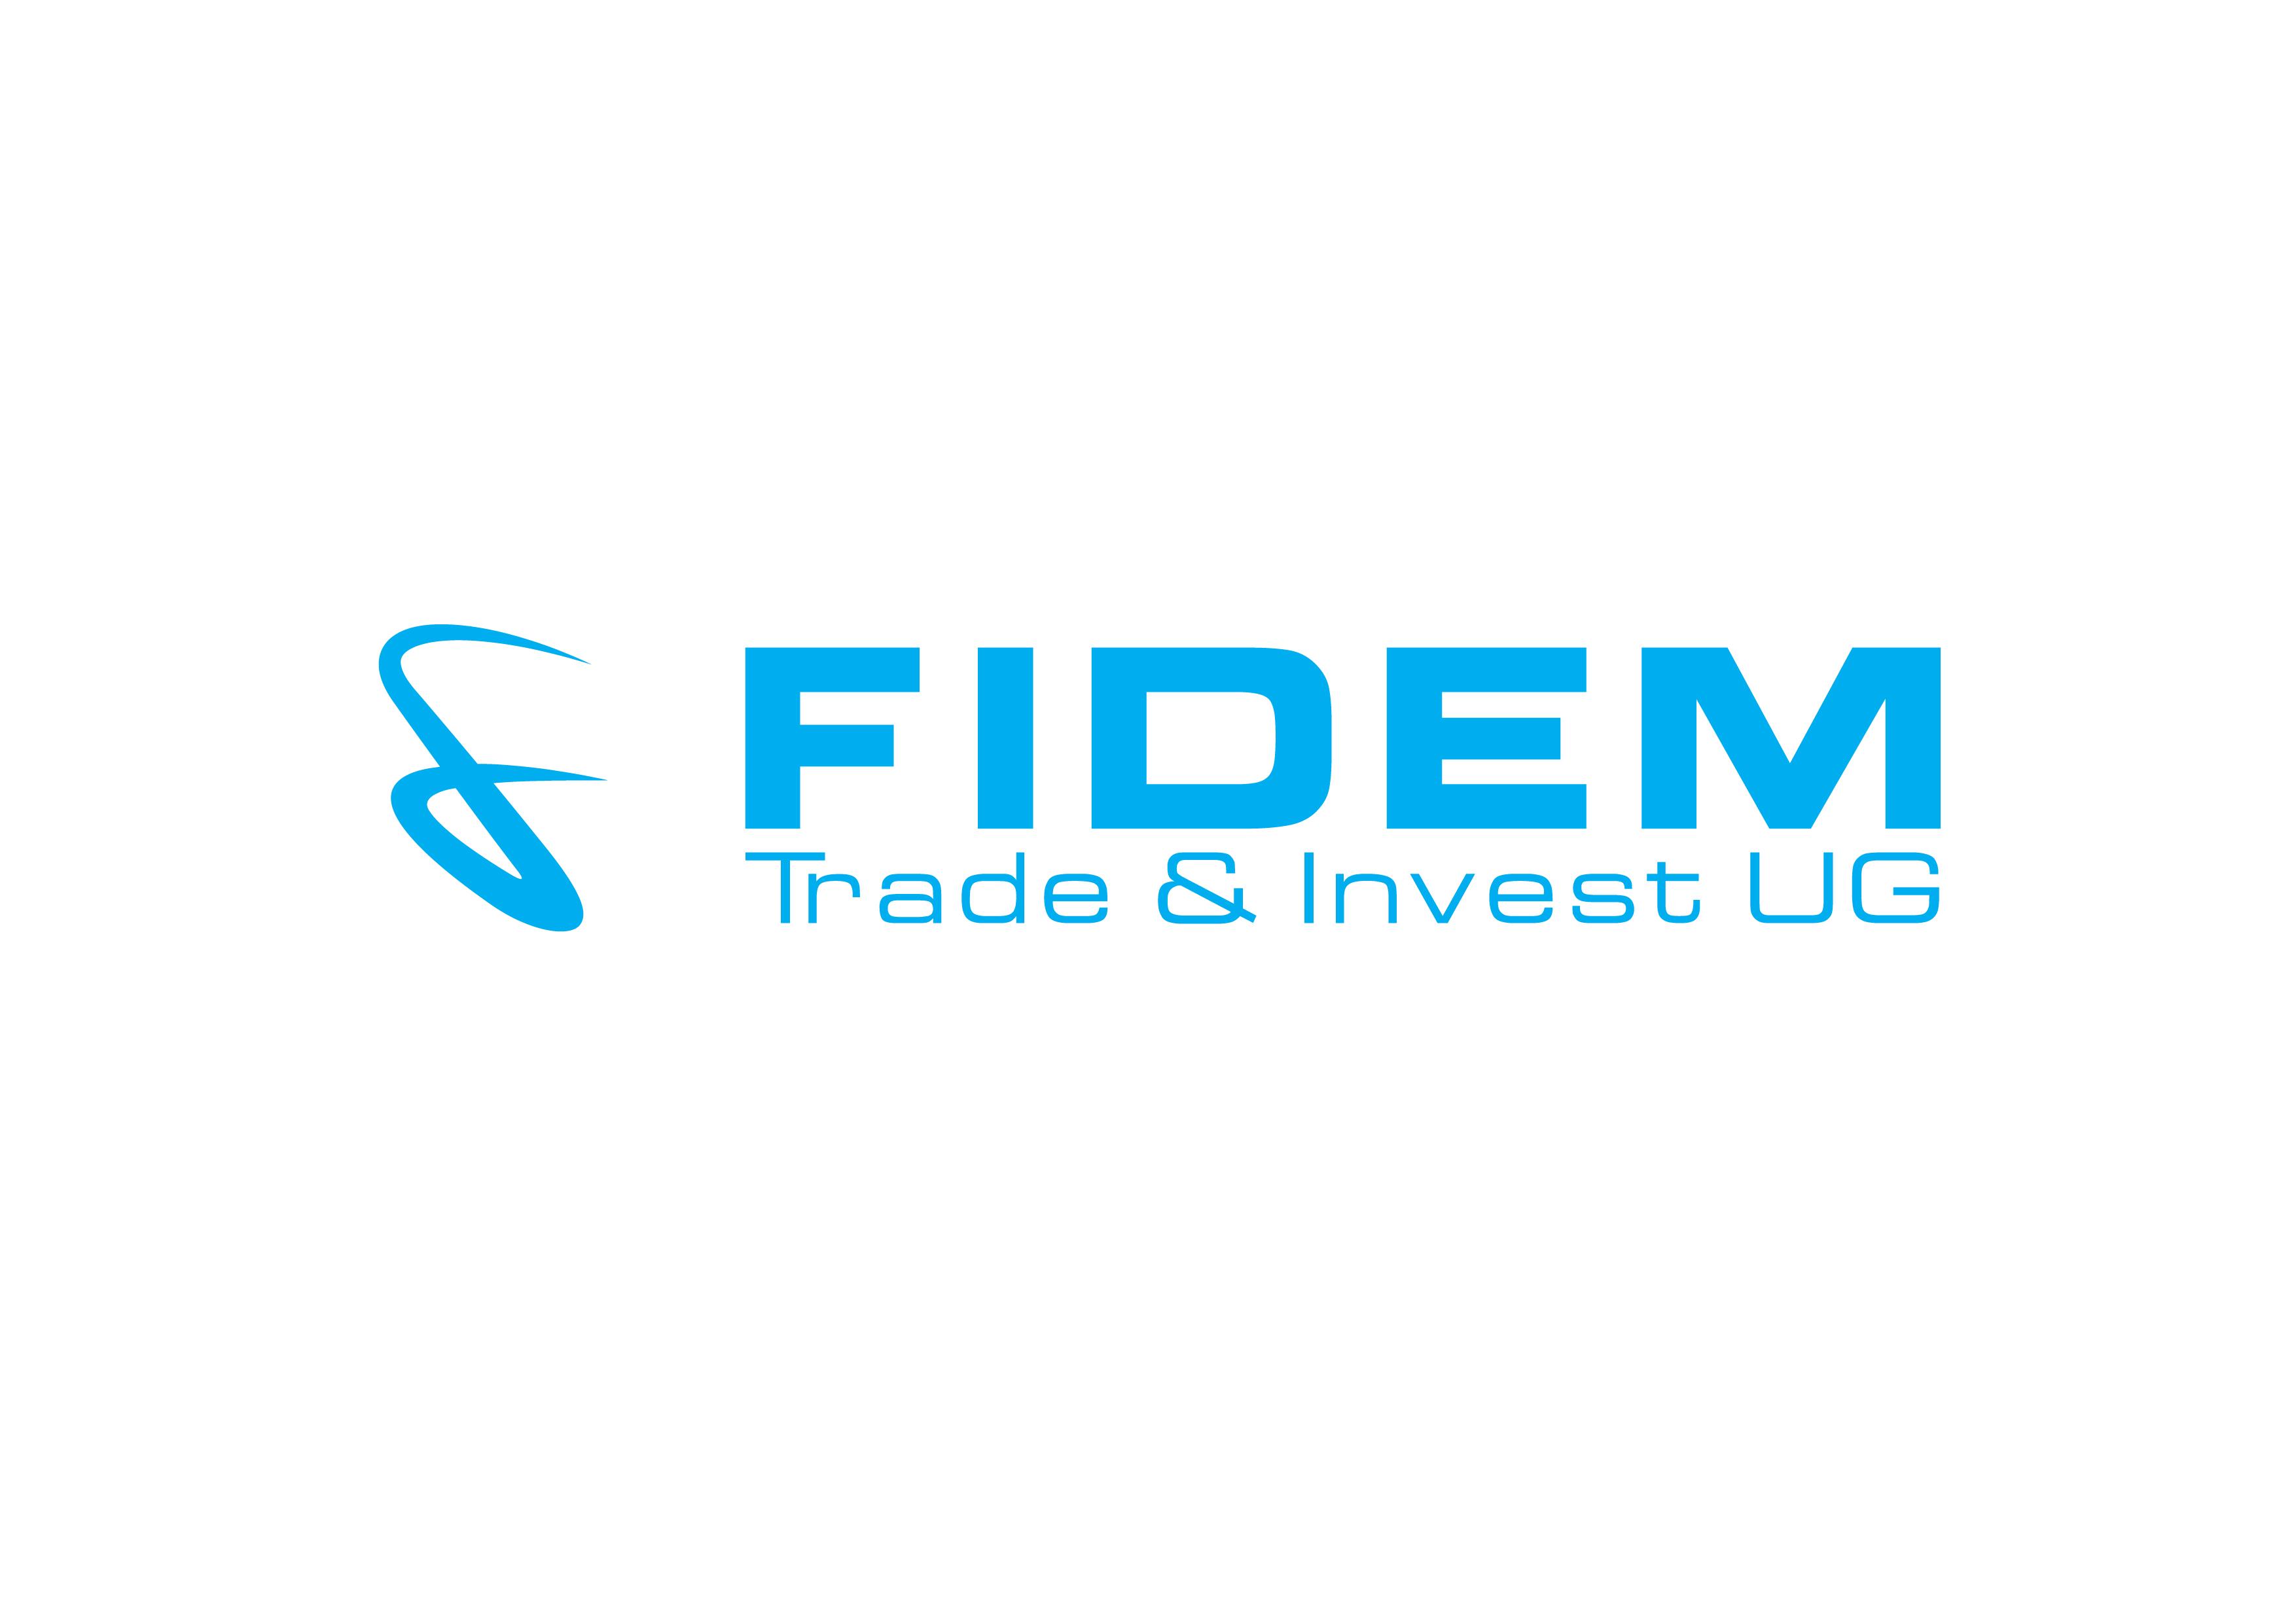 Logo Design by 3draw - Entry No. 691 in the Logo Design Contest Professional Logo Design for FIDEM Trade & Invest UG.